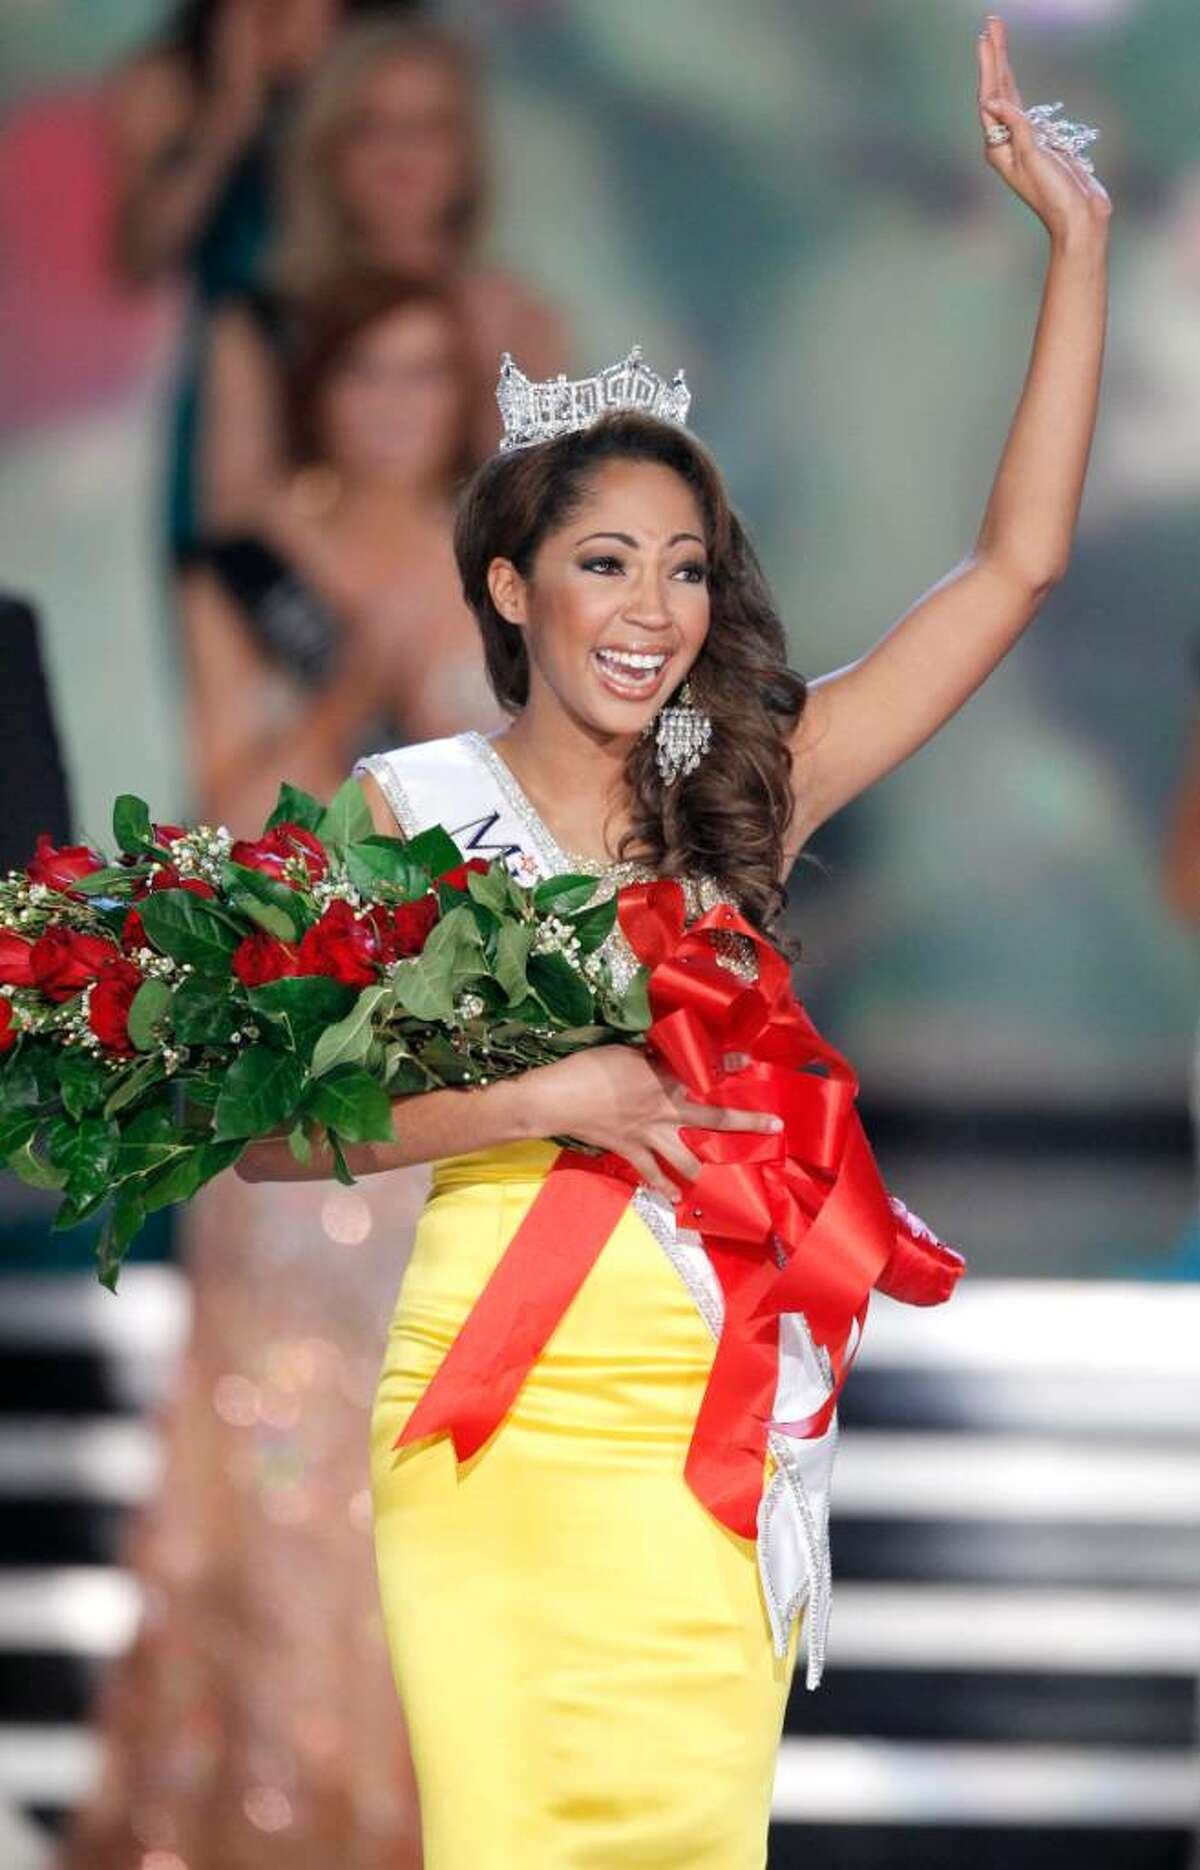 Miss Virginia Caressa Cameron reacts after being crowned Miss America Saturday Jan. 30, 2010 in Las Vegas. (AP Photo/Eric Jamison)